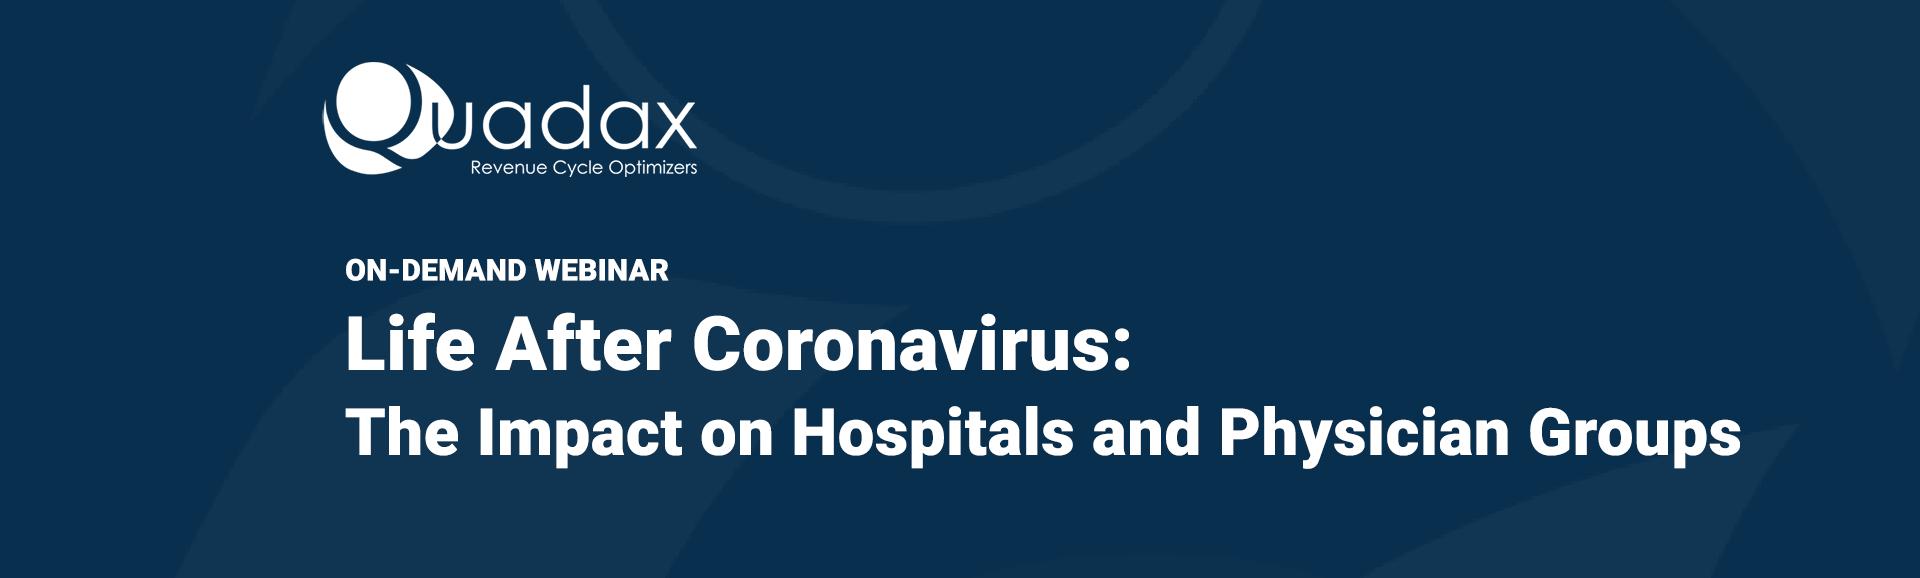 On-Demand-Webinar-Landing-Page-Life-After-Coronavirus